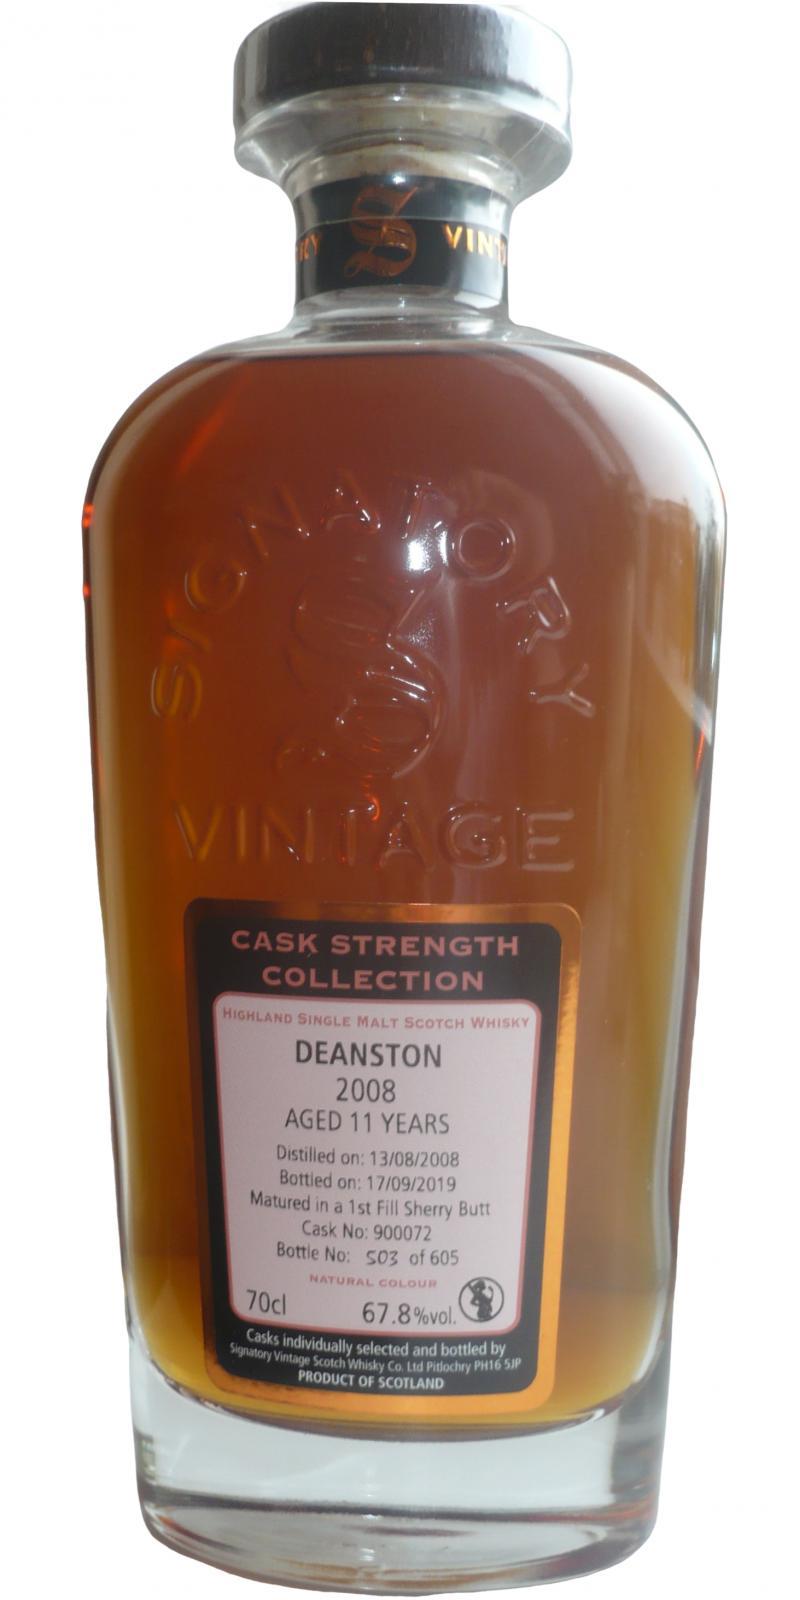 Deanston 2008 SV